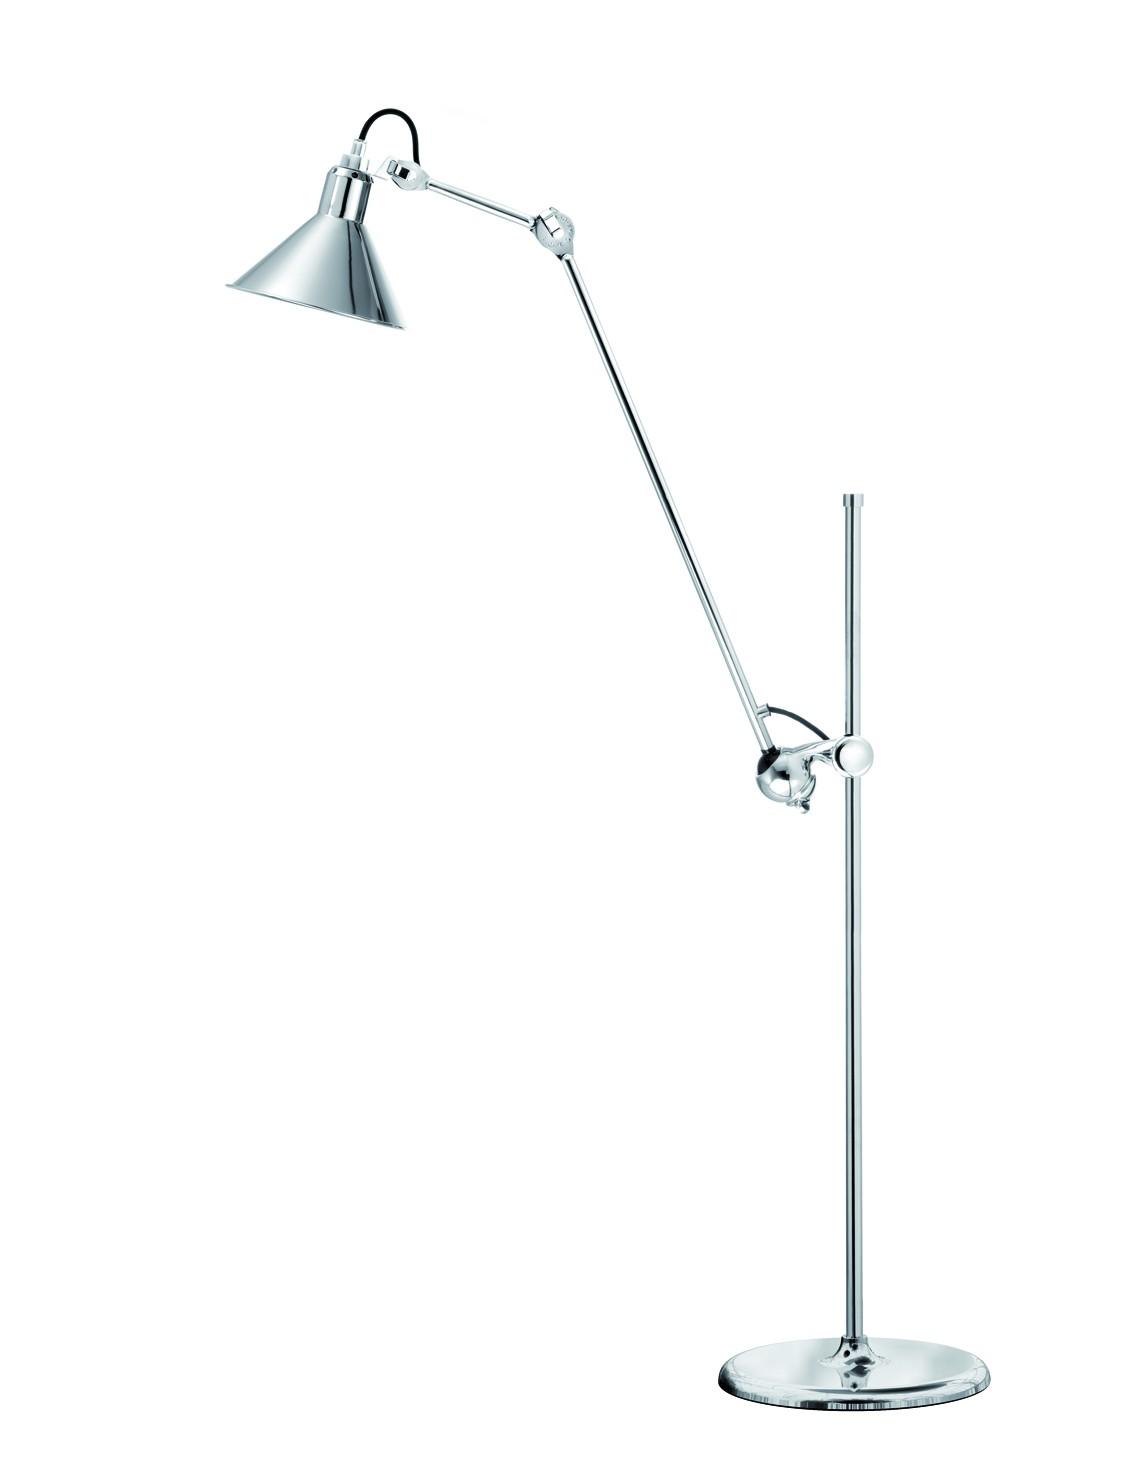 luminaires lampes gras lampadaire articul gras n 215. Black Bedroom Furniture Sets. Home Design Ideas